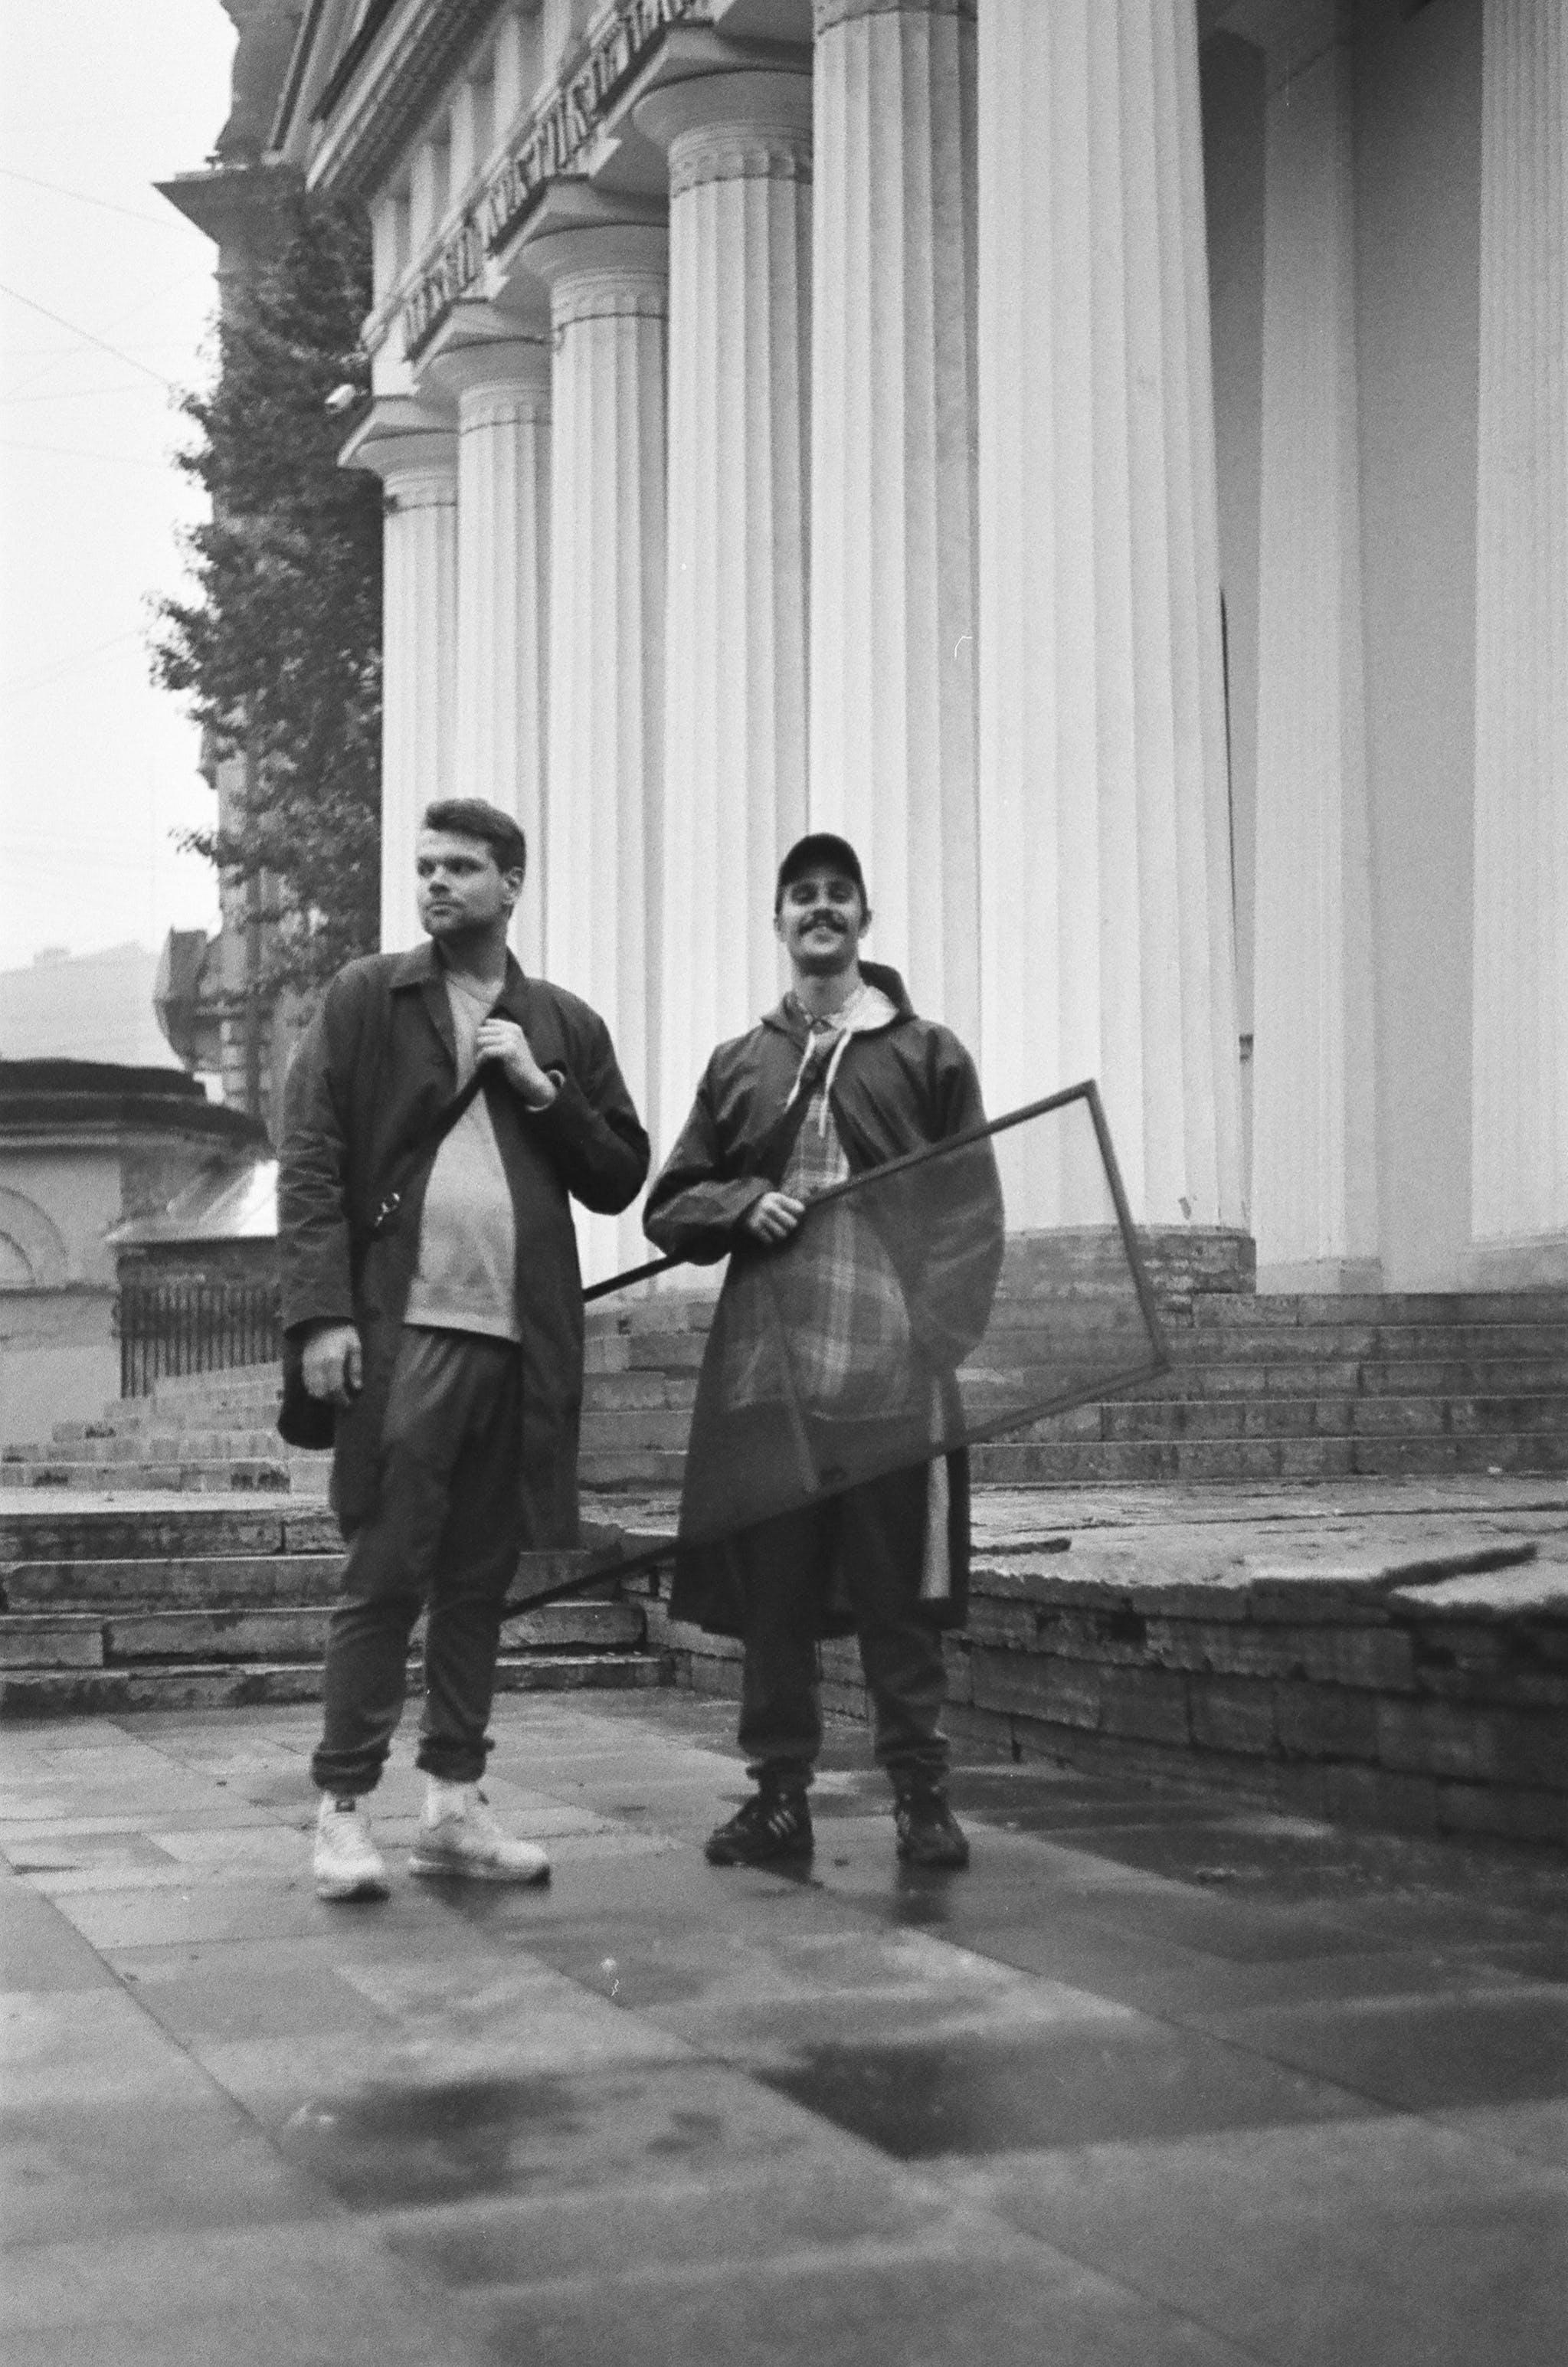 Greyscale Photo of Two Men Standing on Floor